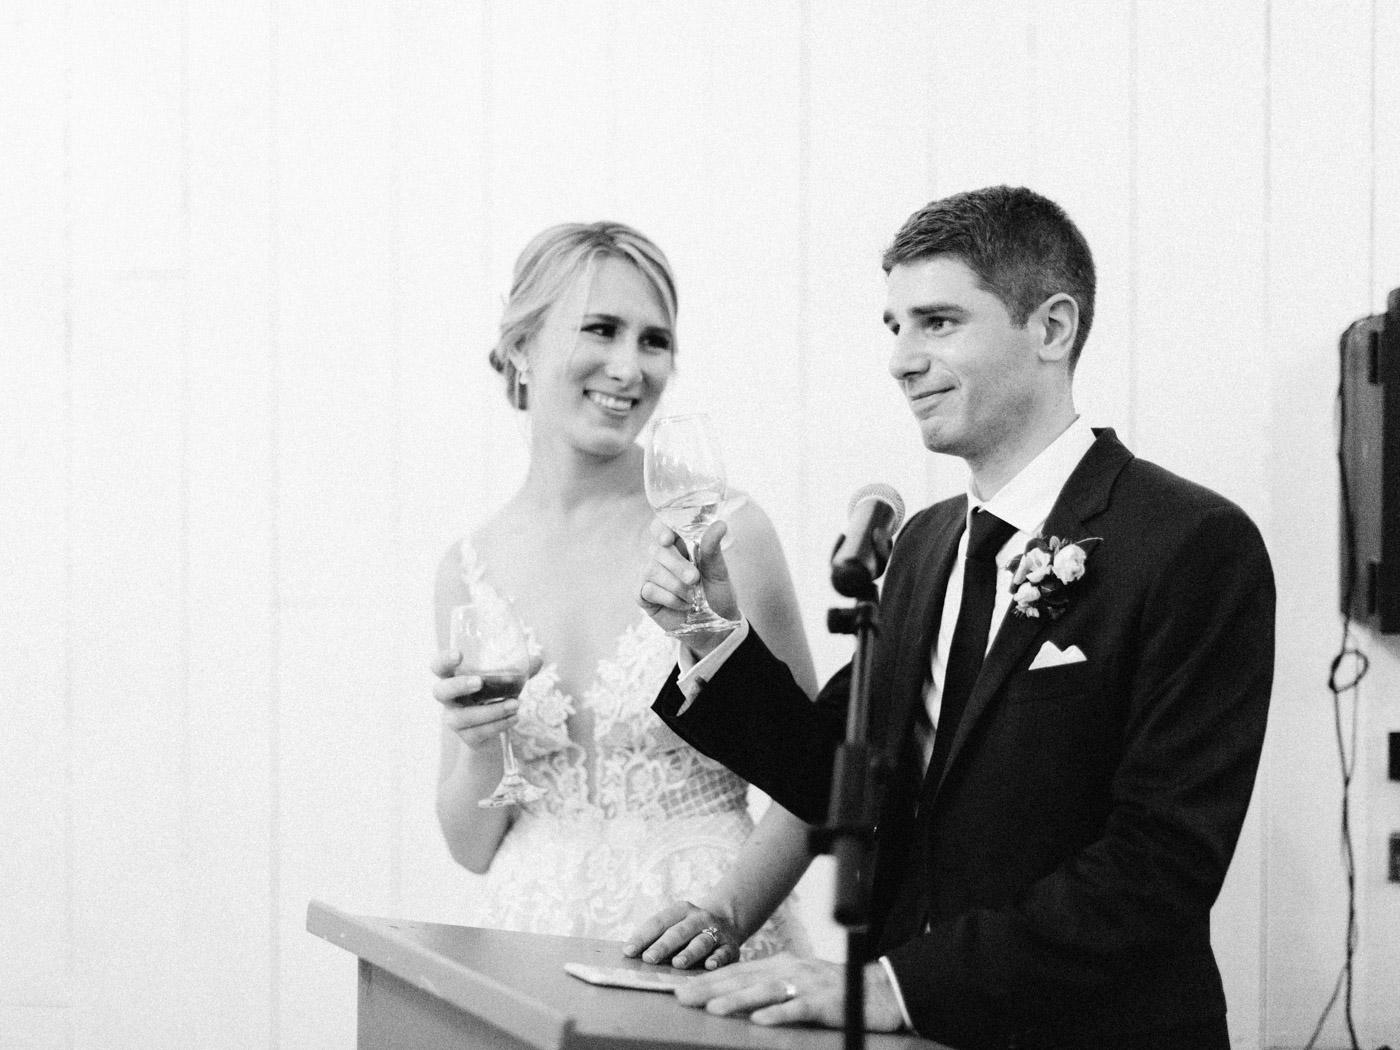 downtown-toronto-wedding-photographer-berkley-fieldhouse-blush-695.jpg